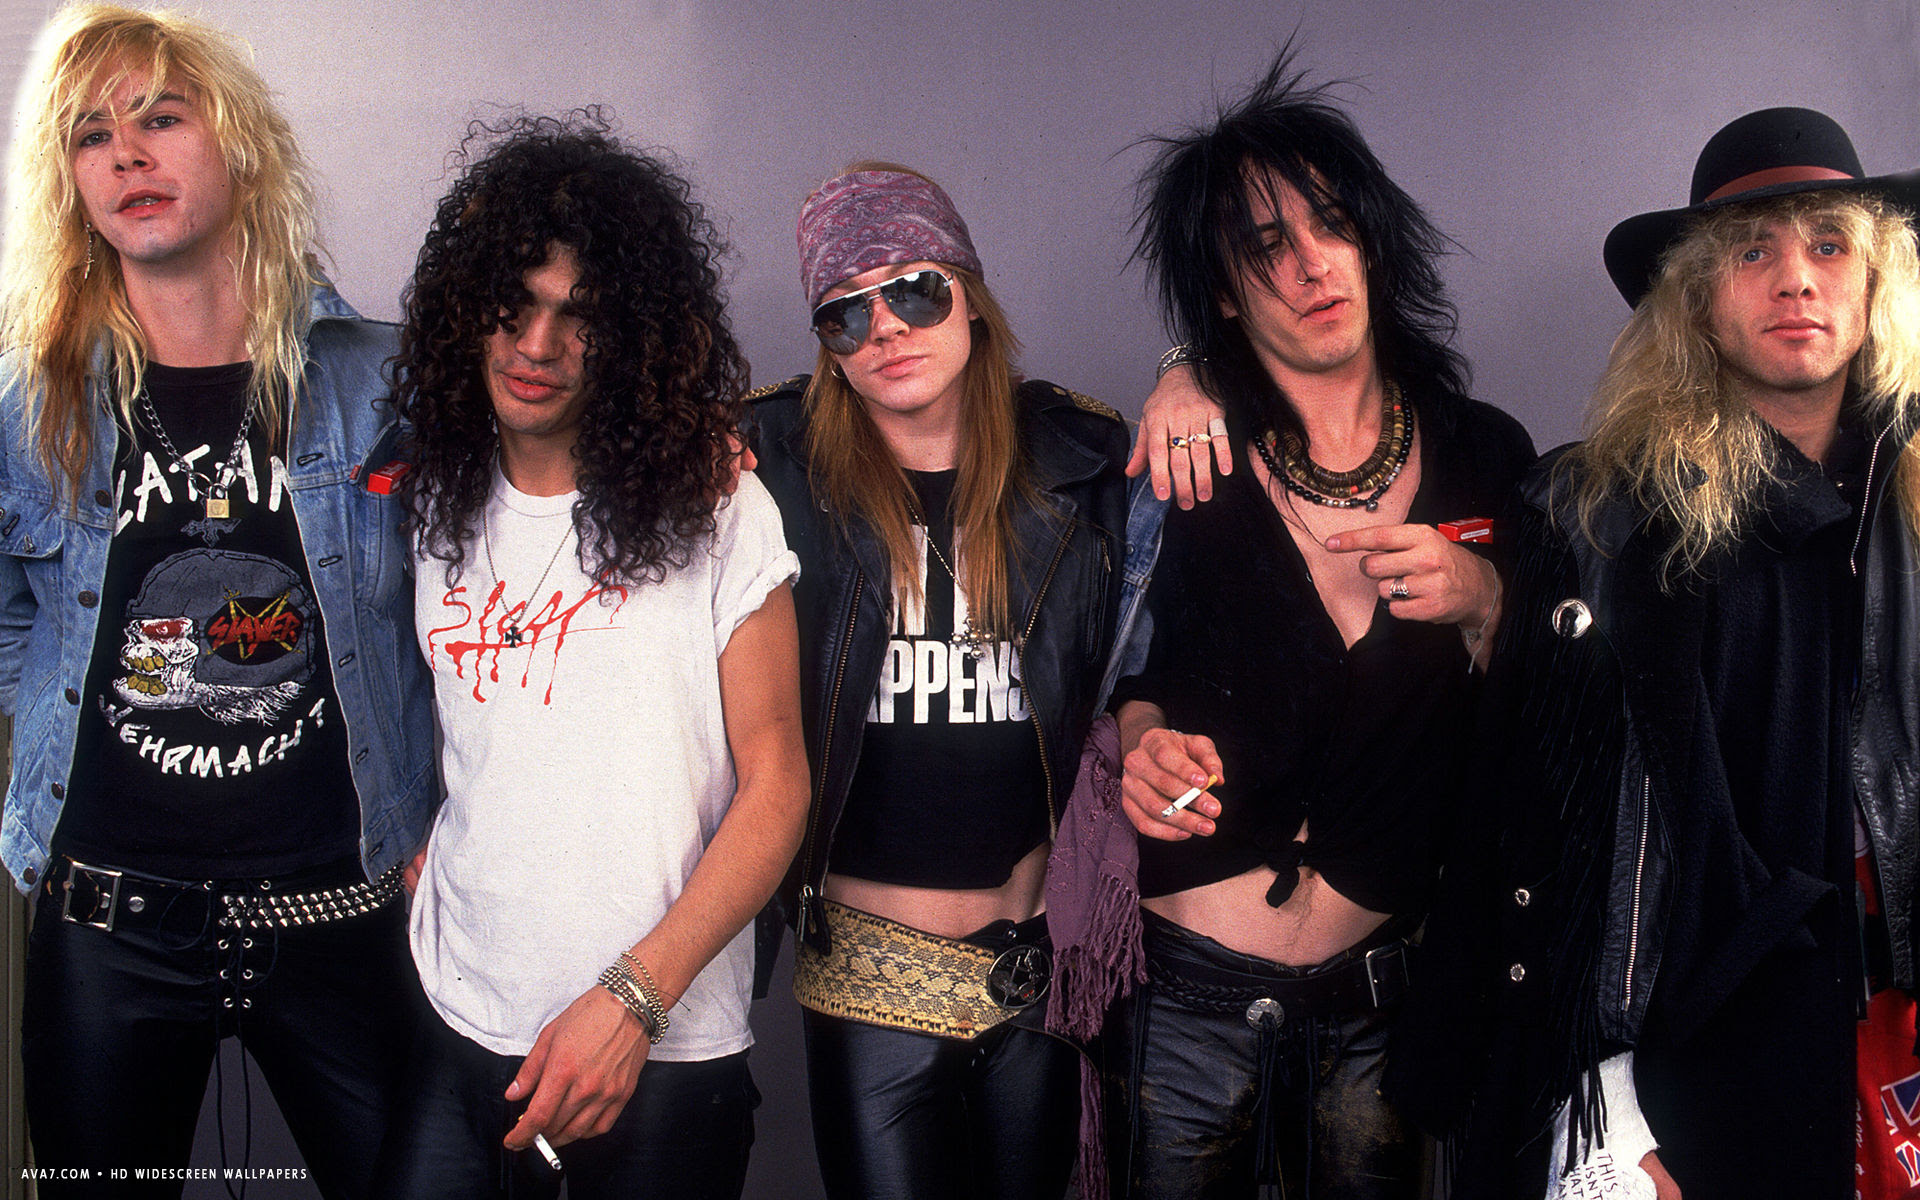 Guns N Roses Music Band Group Hd Widescreen Wallpaper Music